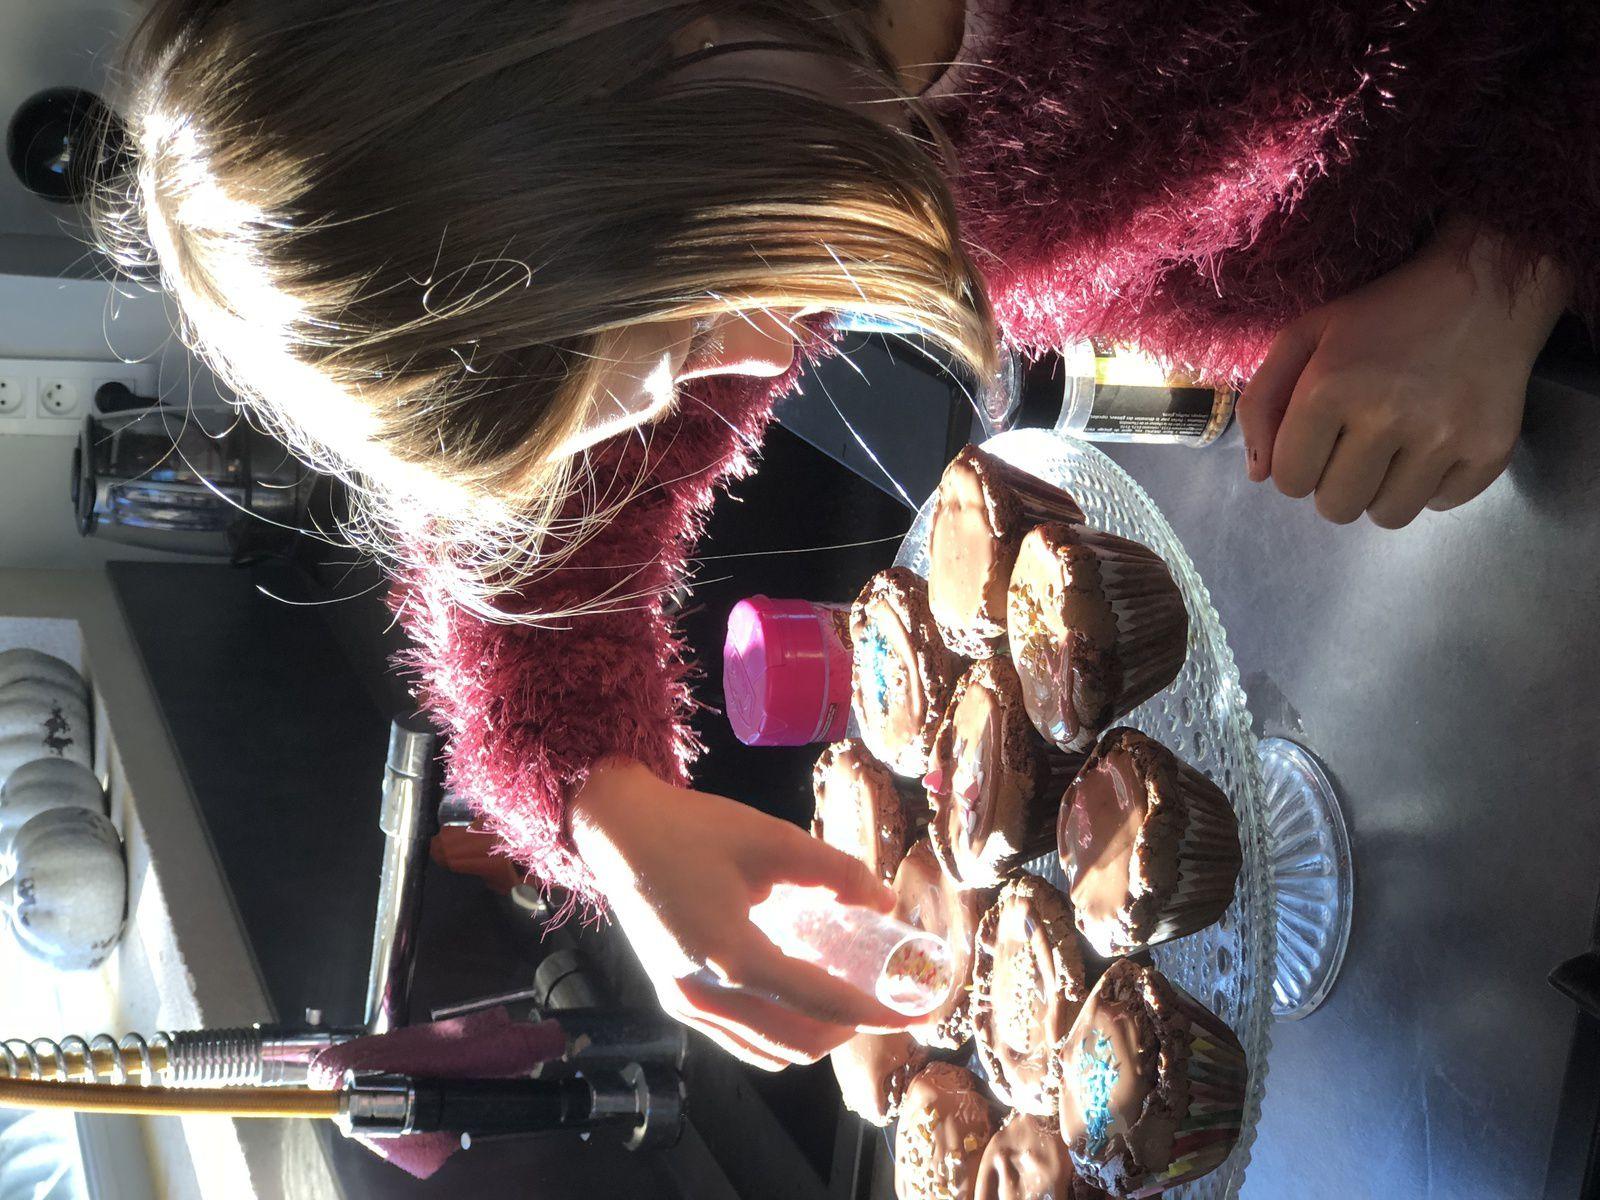 Les Ateliers de Sam - Sabine Bolzan - Cupcakes au chocolat